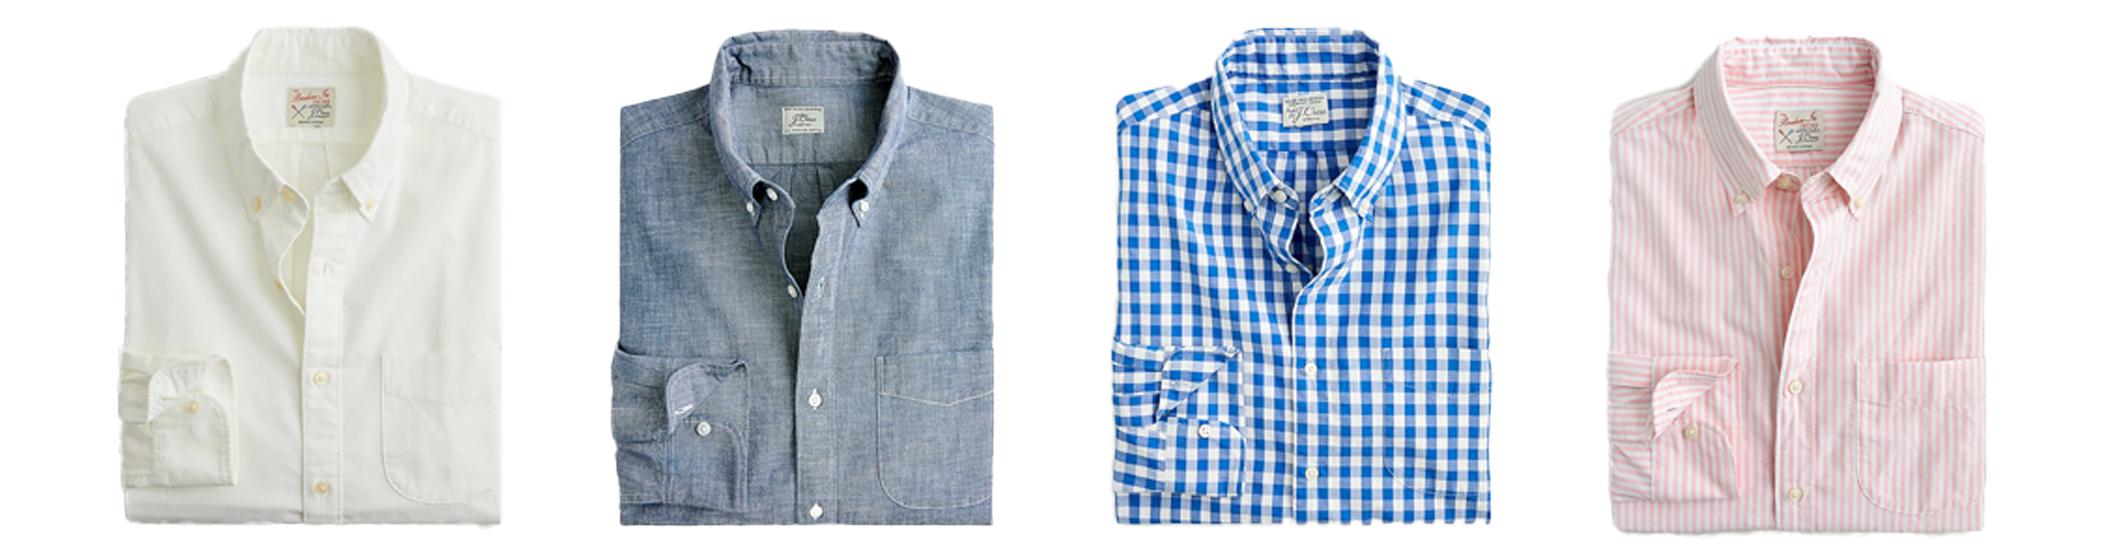 Men Long-sleeve shirts